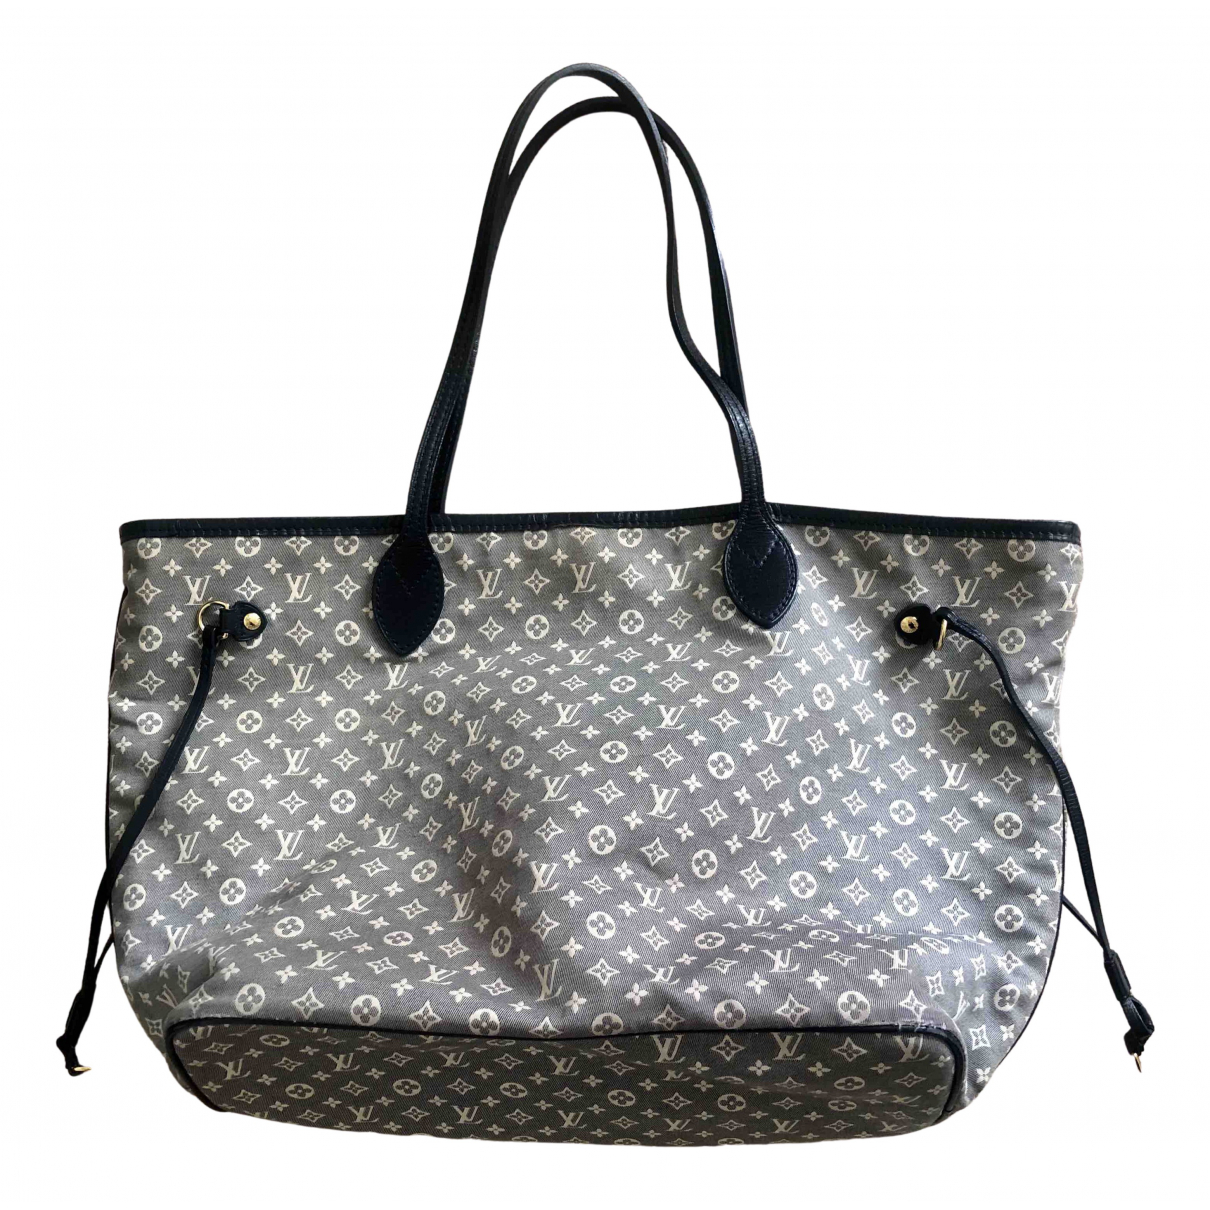 Louis Vuitton Neverfull Blue Cloth handbag for Women N